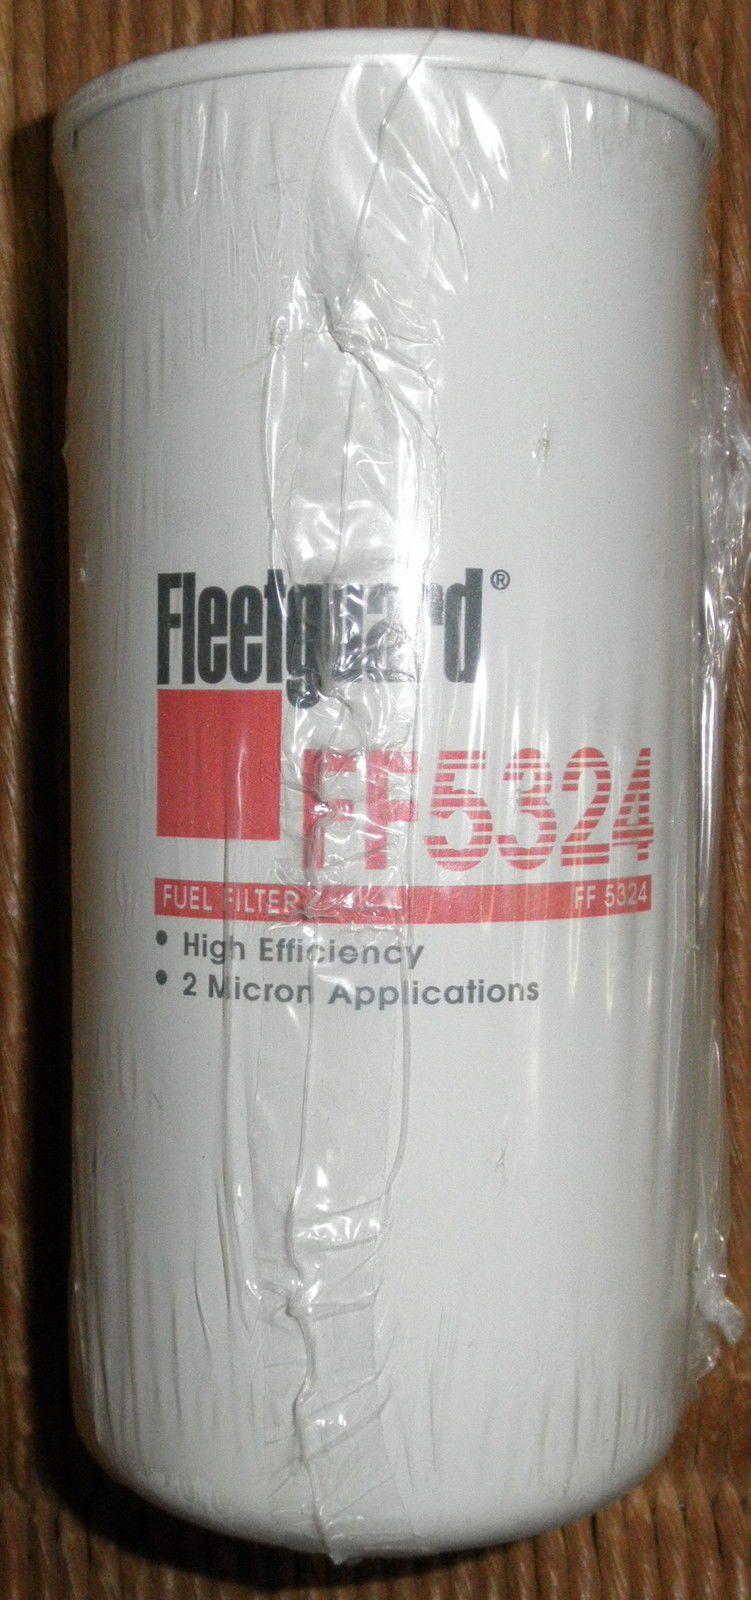 hight resolution of fleetguard ff5324 diesel fuel filter cat engines wix 33626 1r0751 1r 0751 dp equipment llc